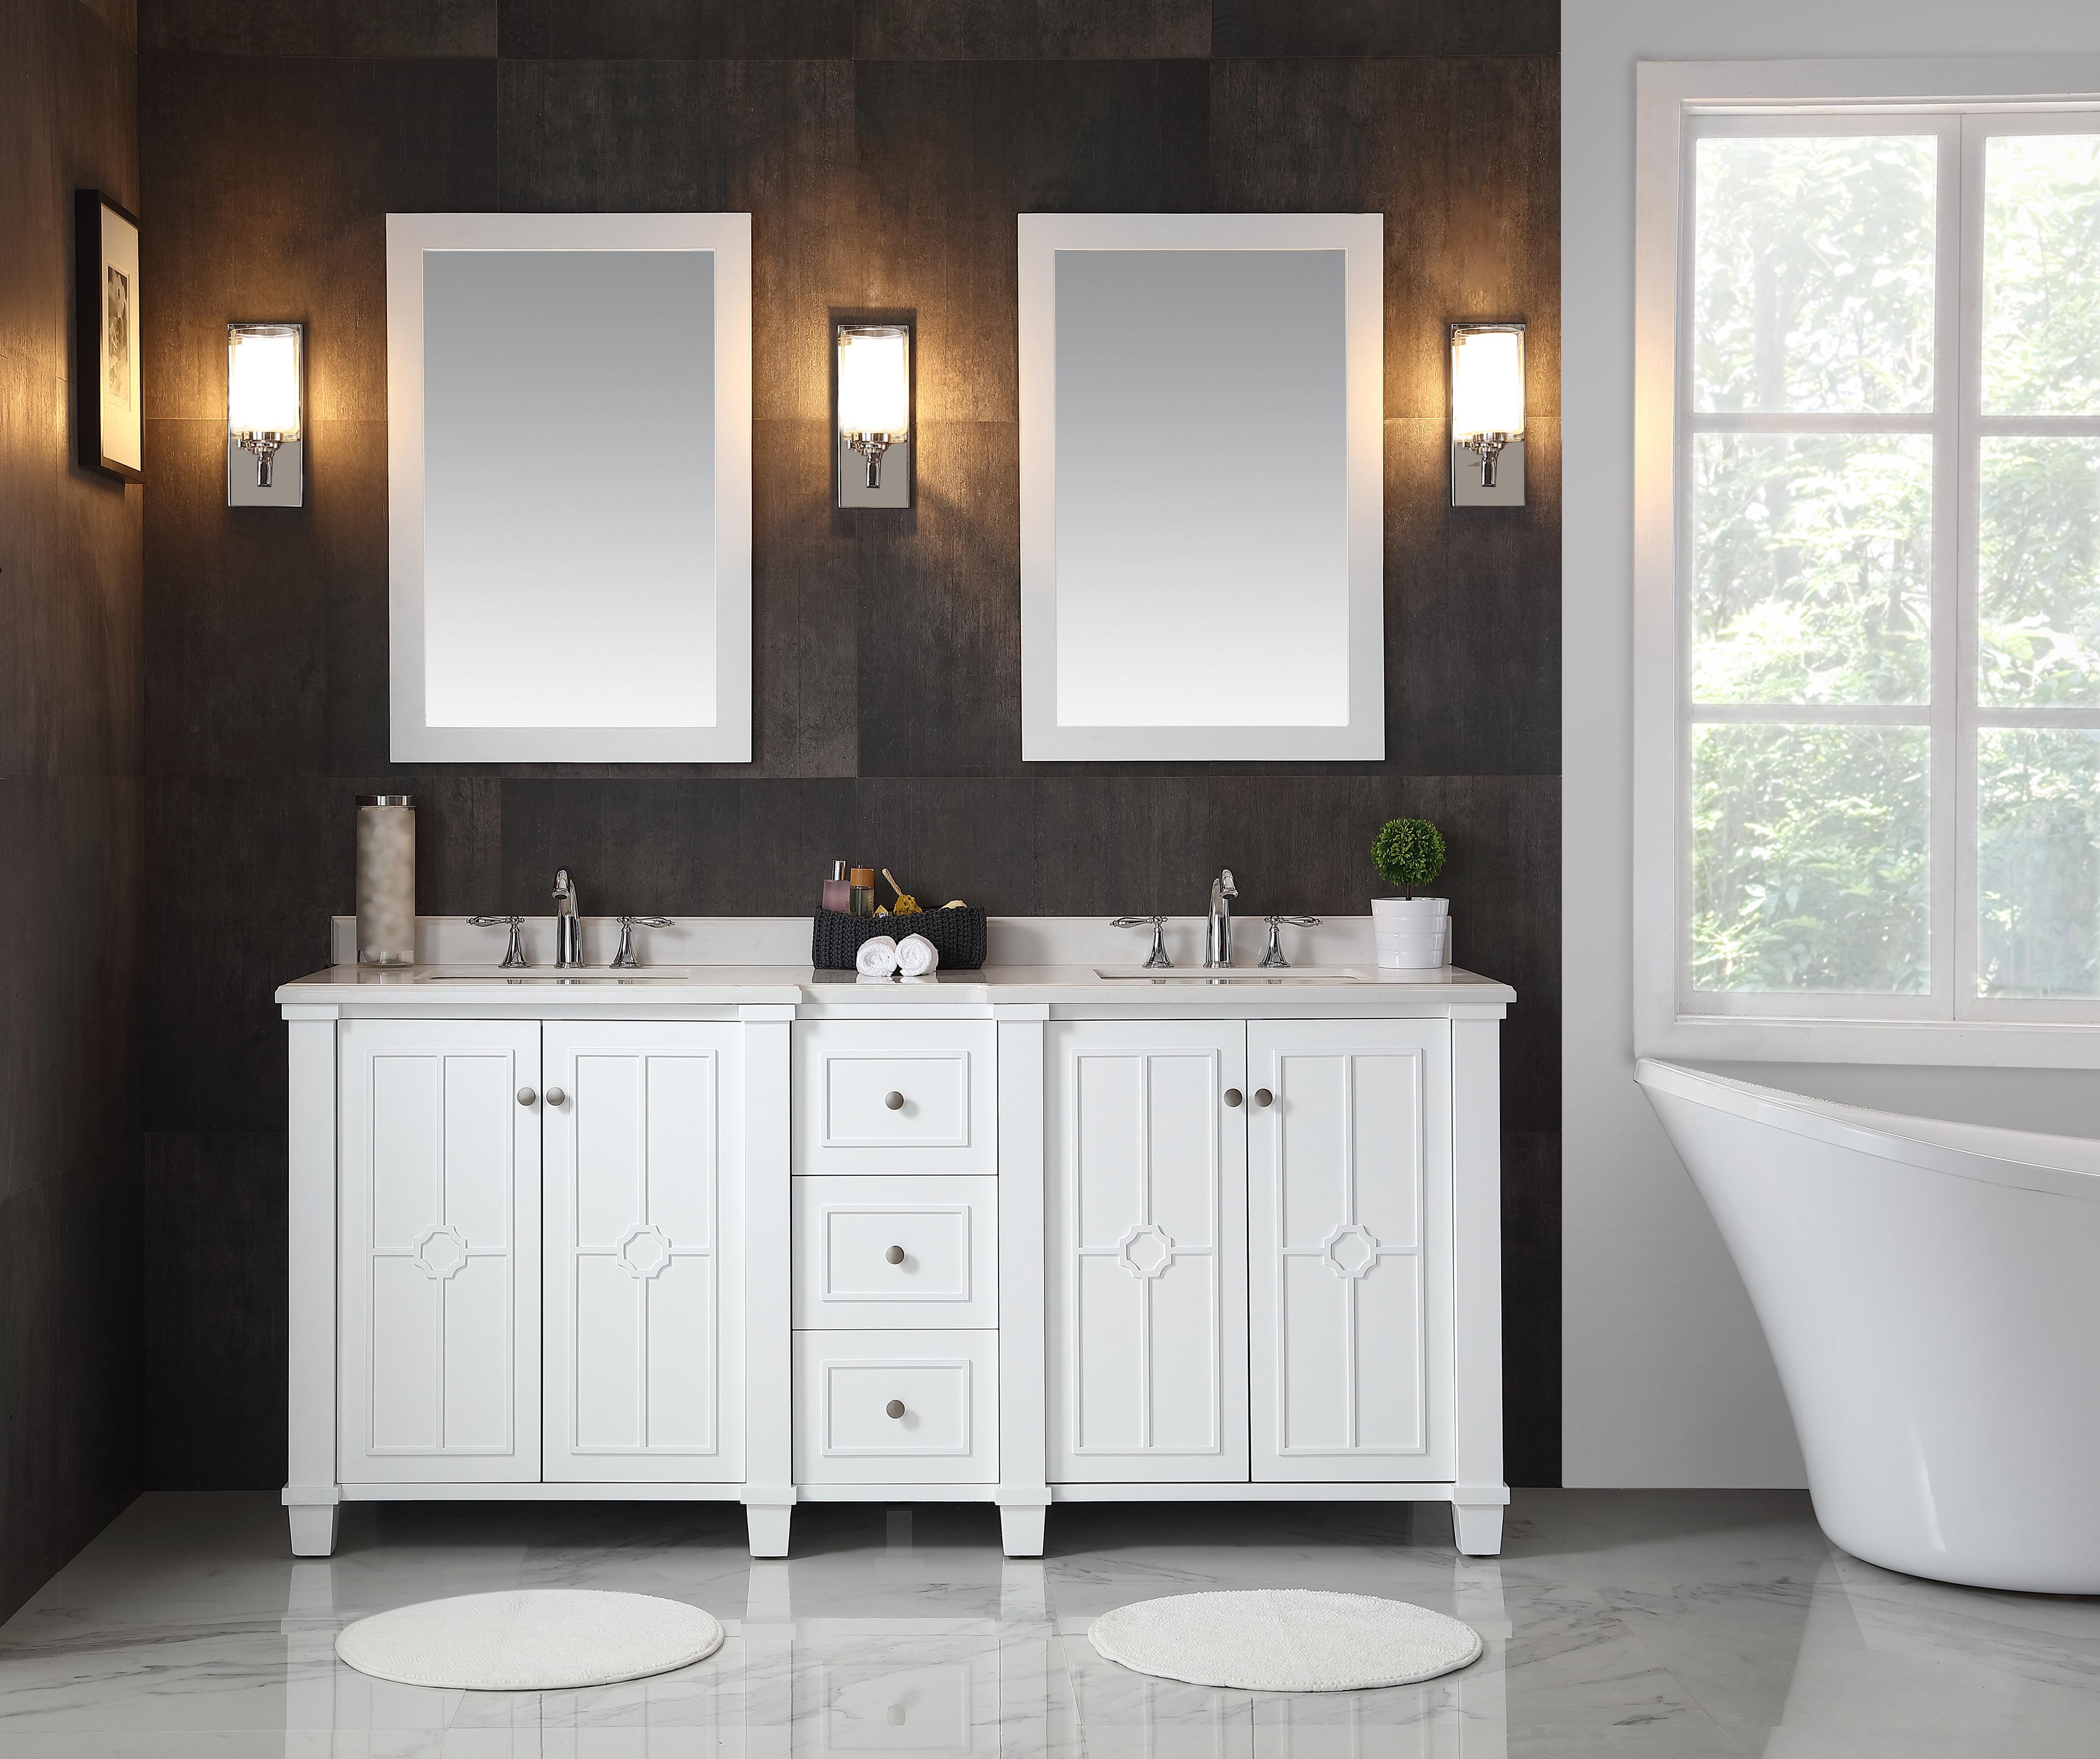 Jessica Ma DESIGN[ER] - Product development & design: Bathroom vanities